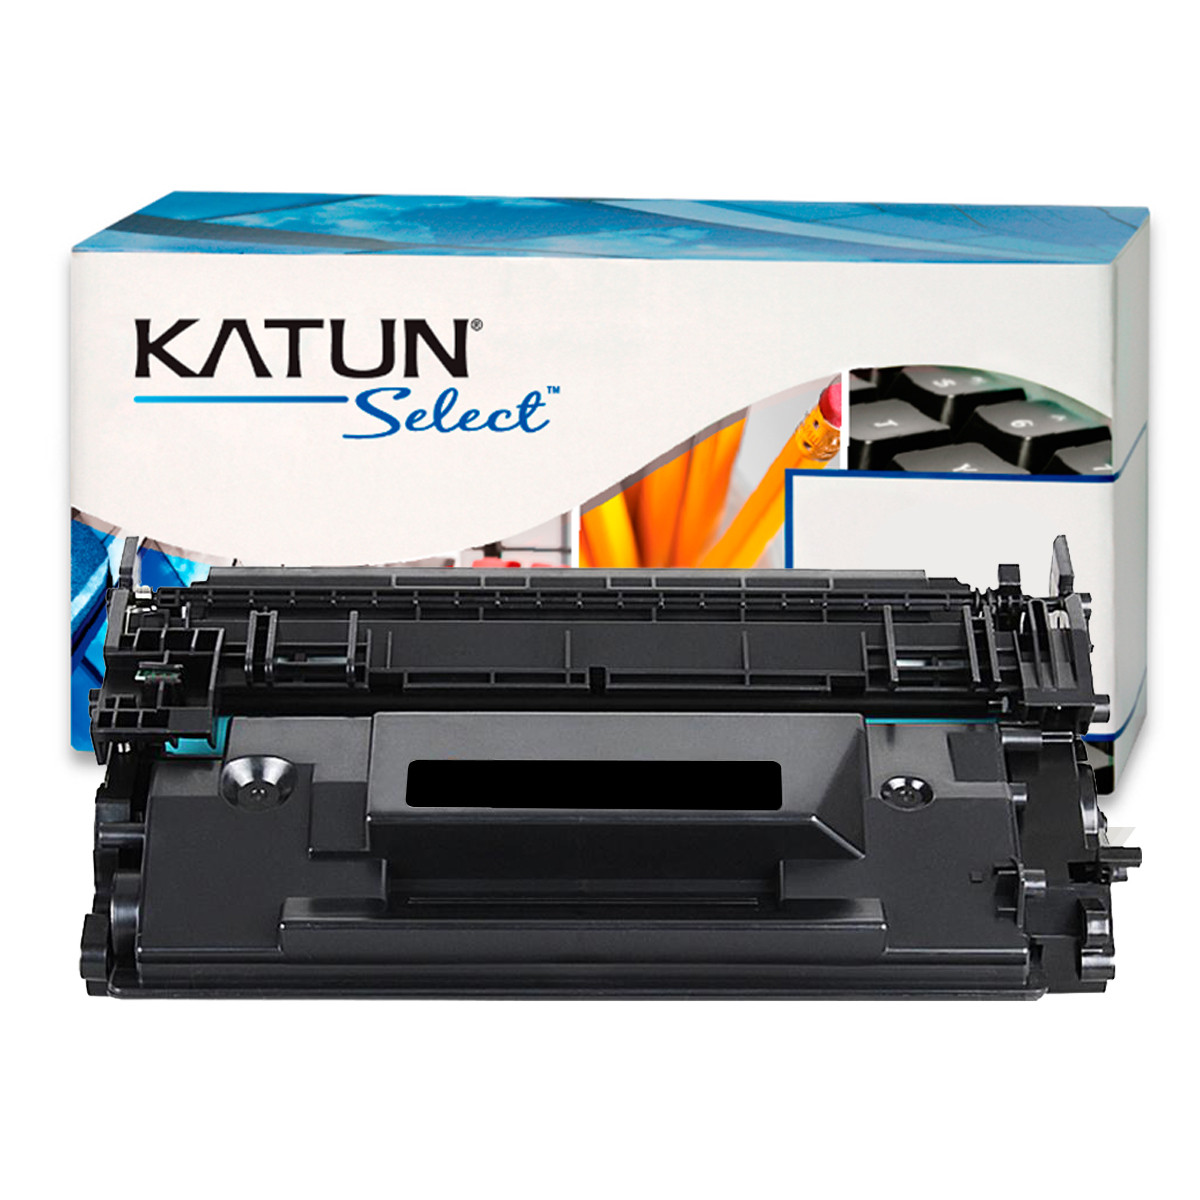 Toner Compatível com HP CF226X 226X CF226XB | M426 M426FDW M426DW M402DN M402N | Katun Select 9k